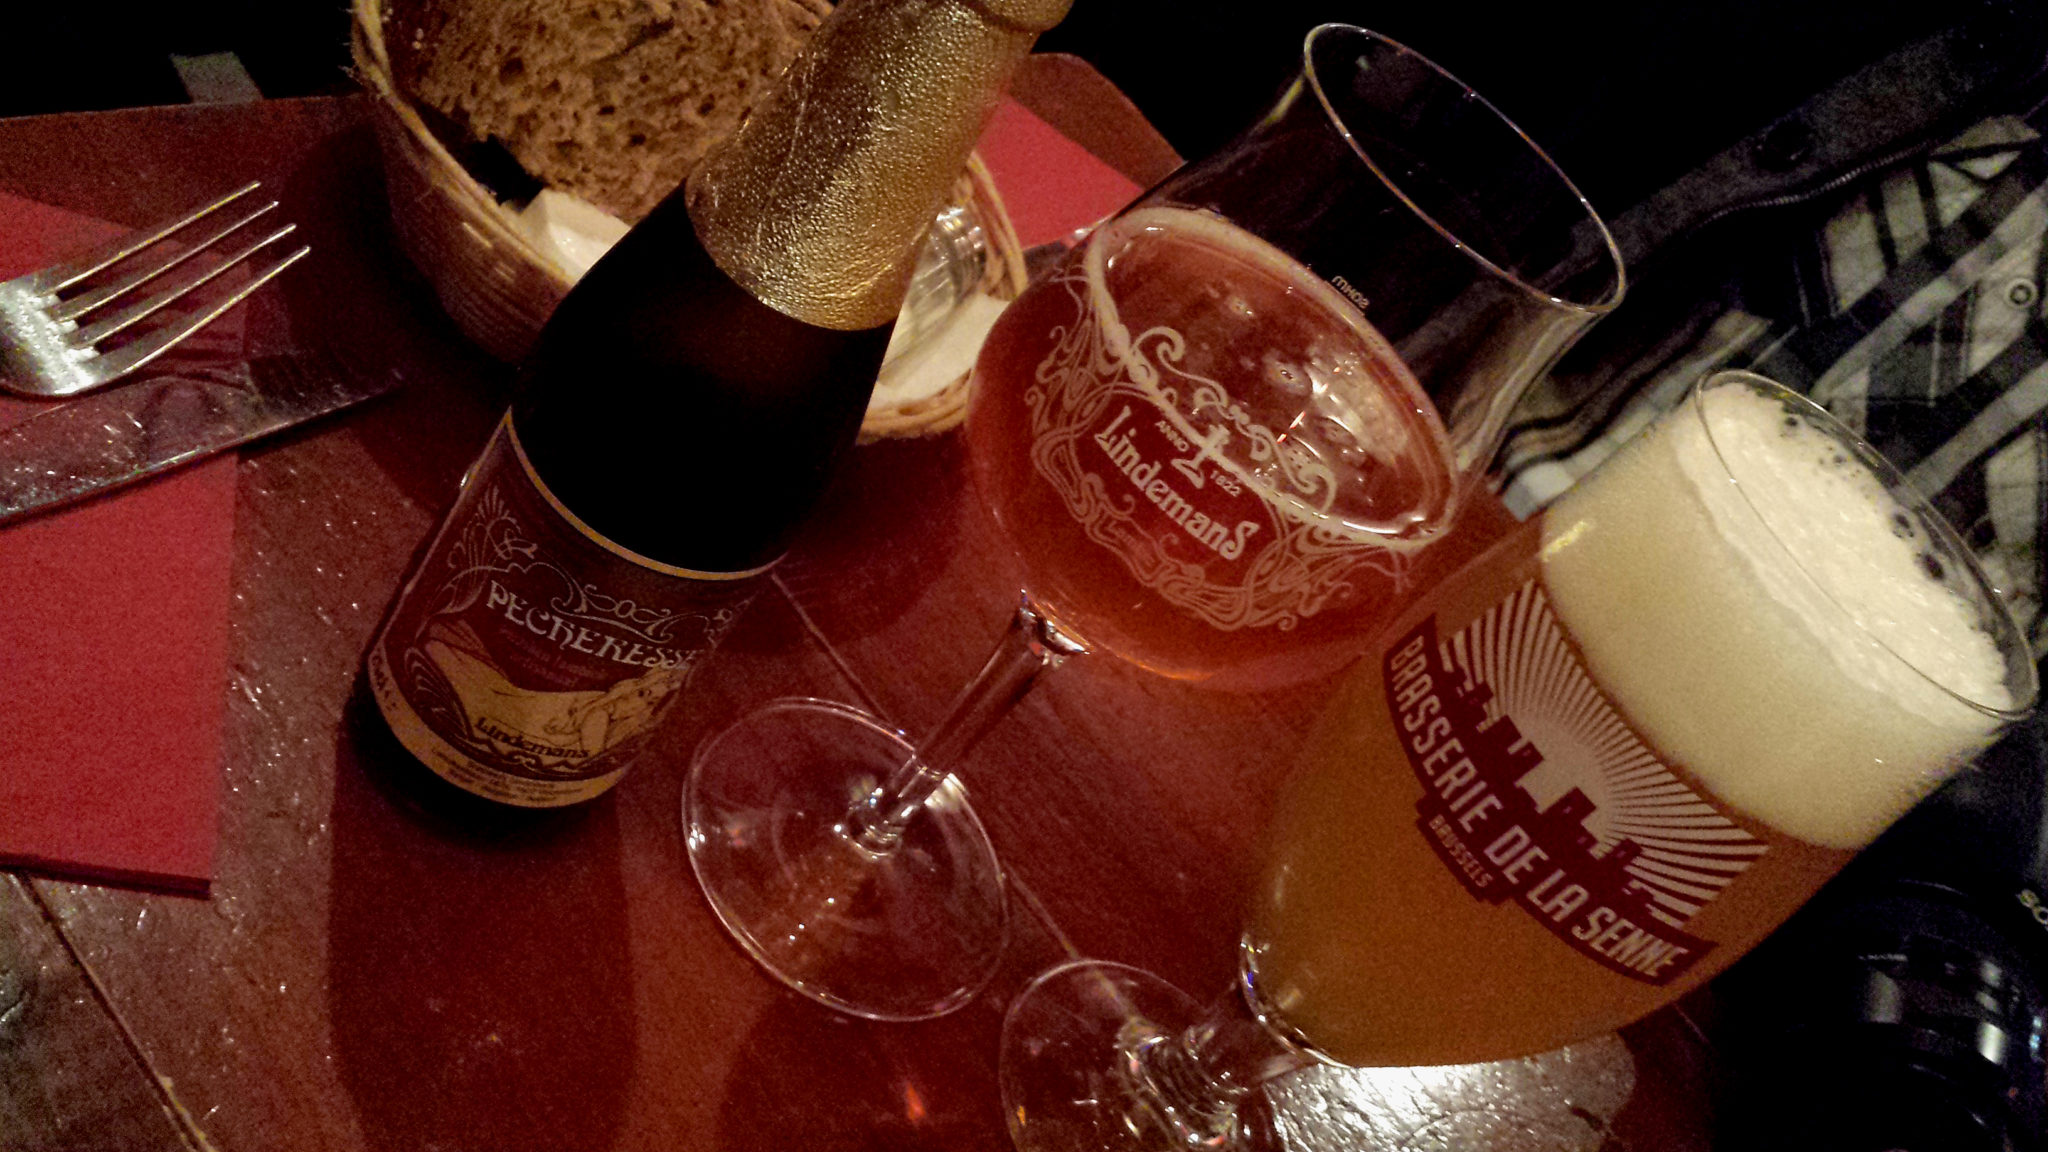 Hema_Bruxelles_bonnes_adresses_9_et_voisins_restaurant_biere_pecheresse